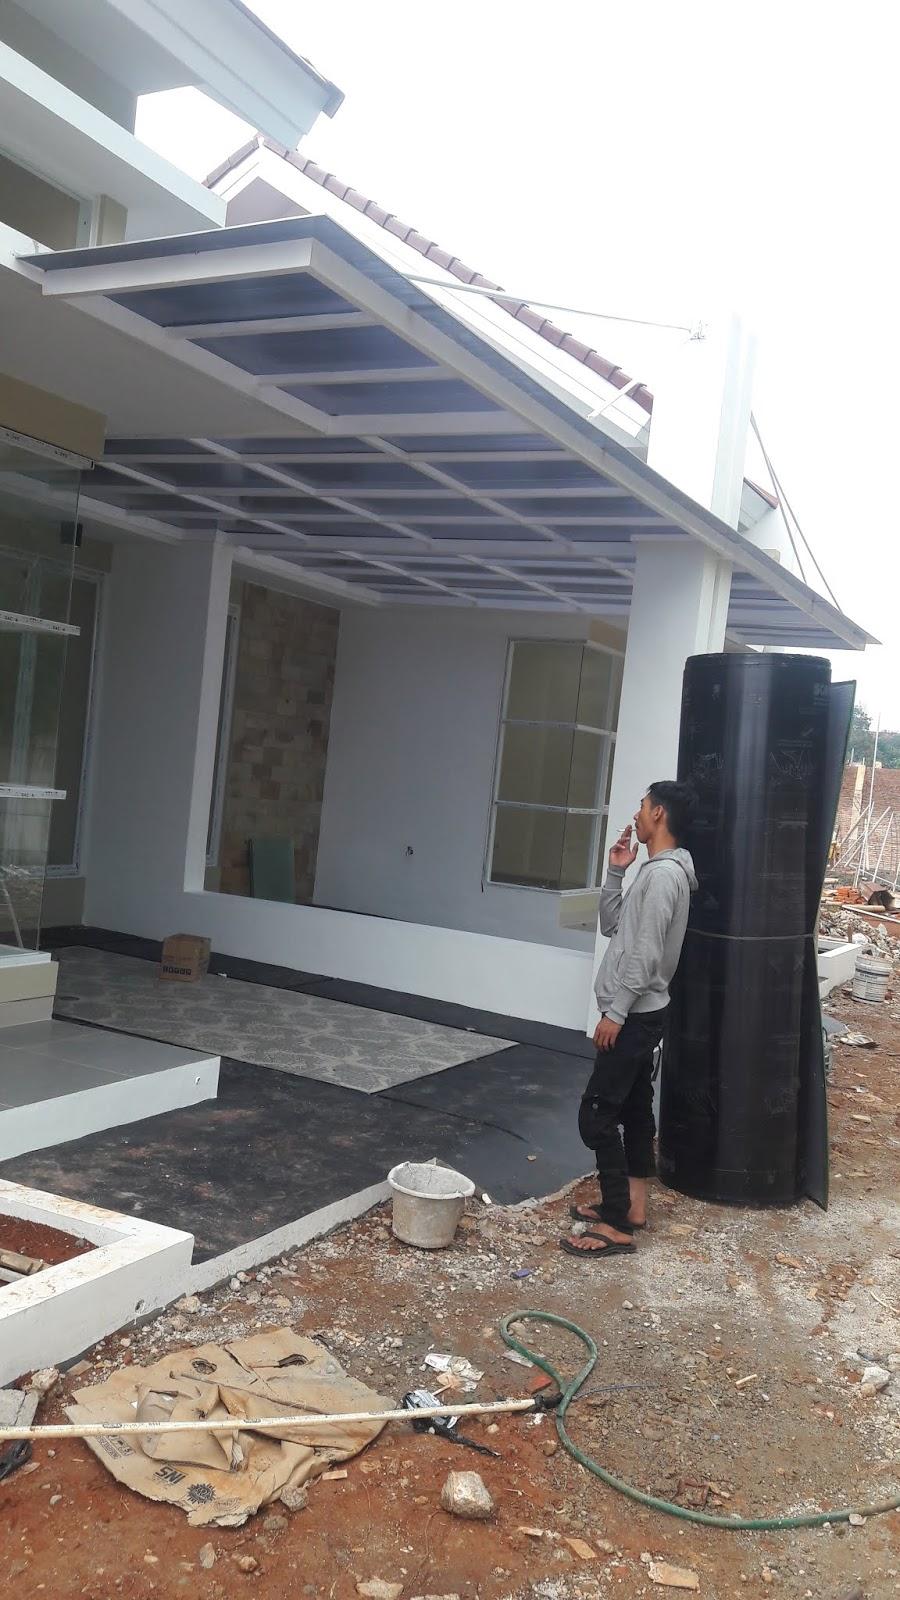 Harga Kanopi Minimalis Terbaru 2019 Jasa Pembuatan Dan Pemasangan Kanopi Tangerang Jakarta Bogor Depok Bekasi